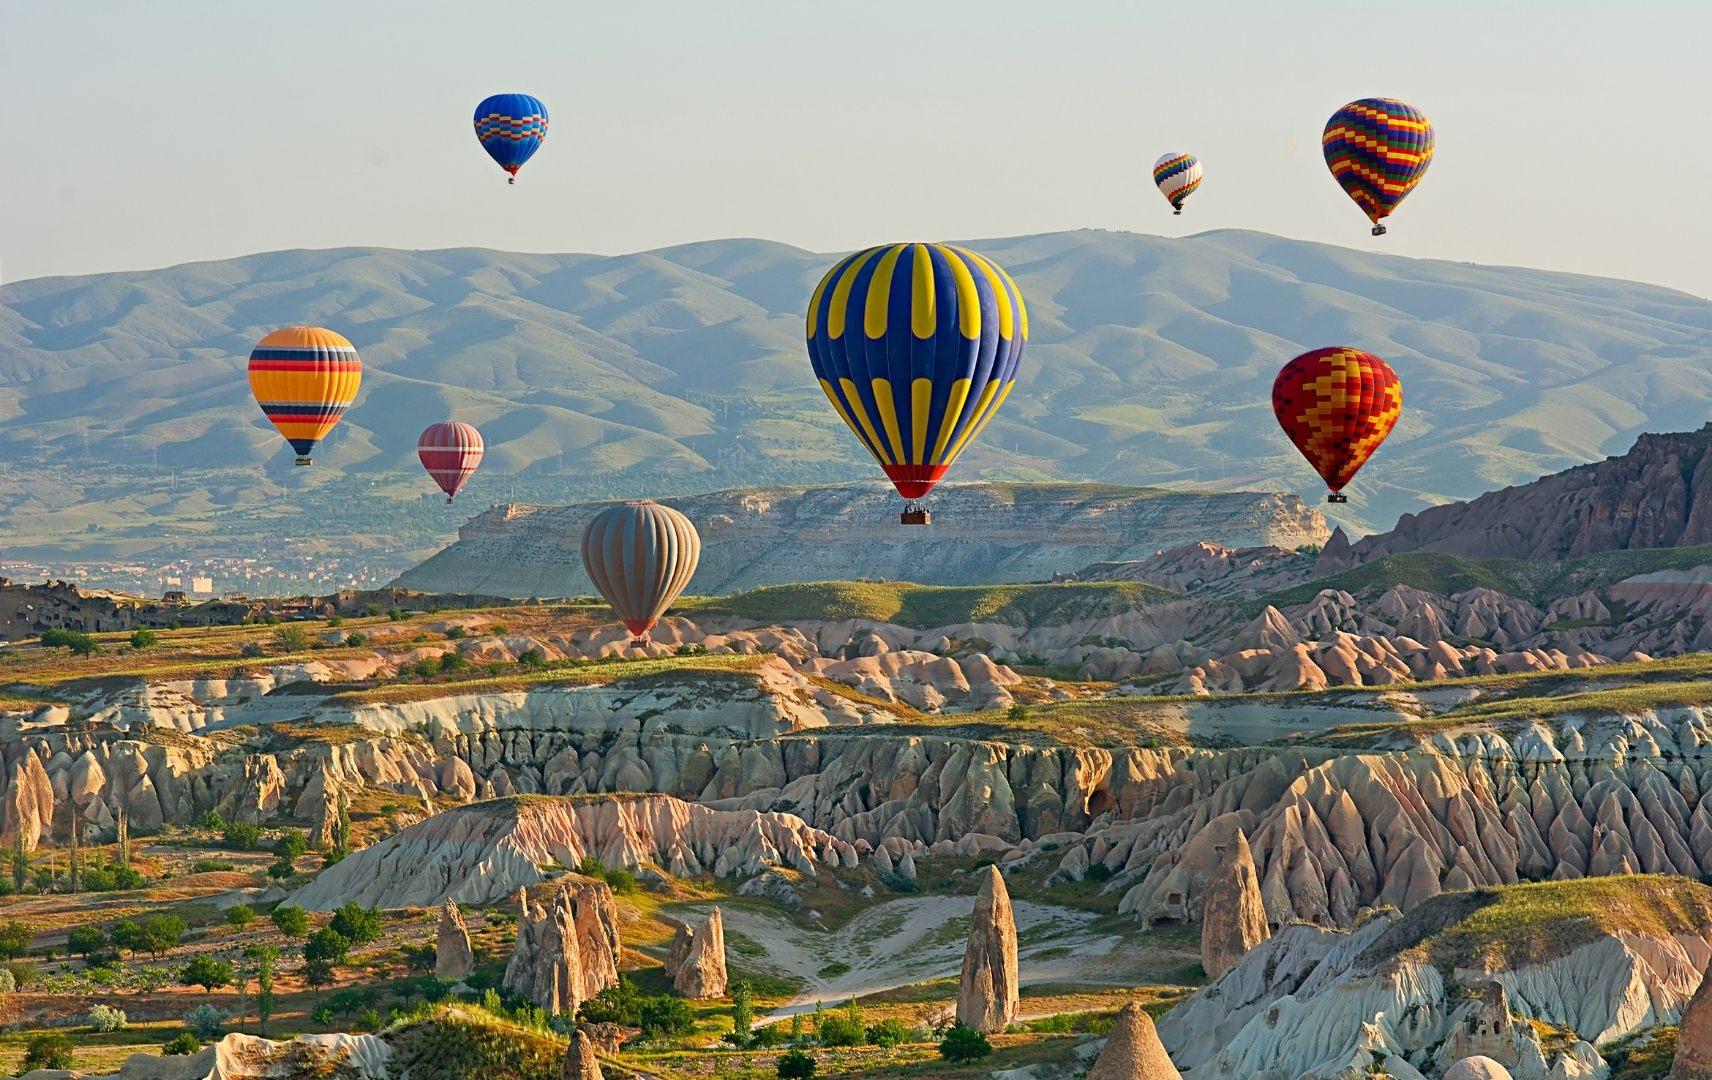 Reiseziel Türkei - Natur Kappadokien